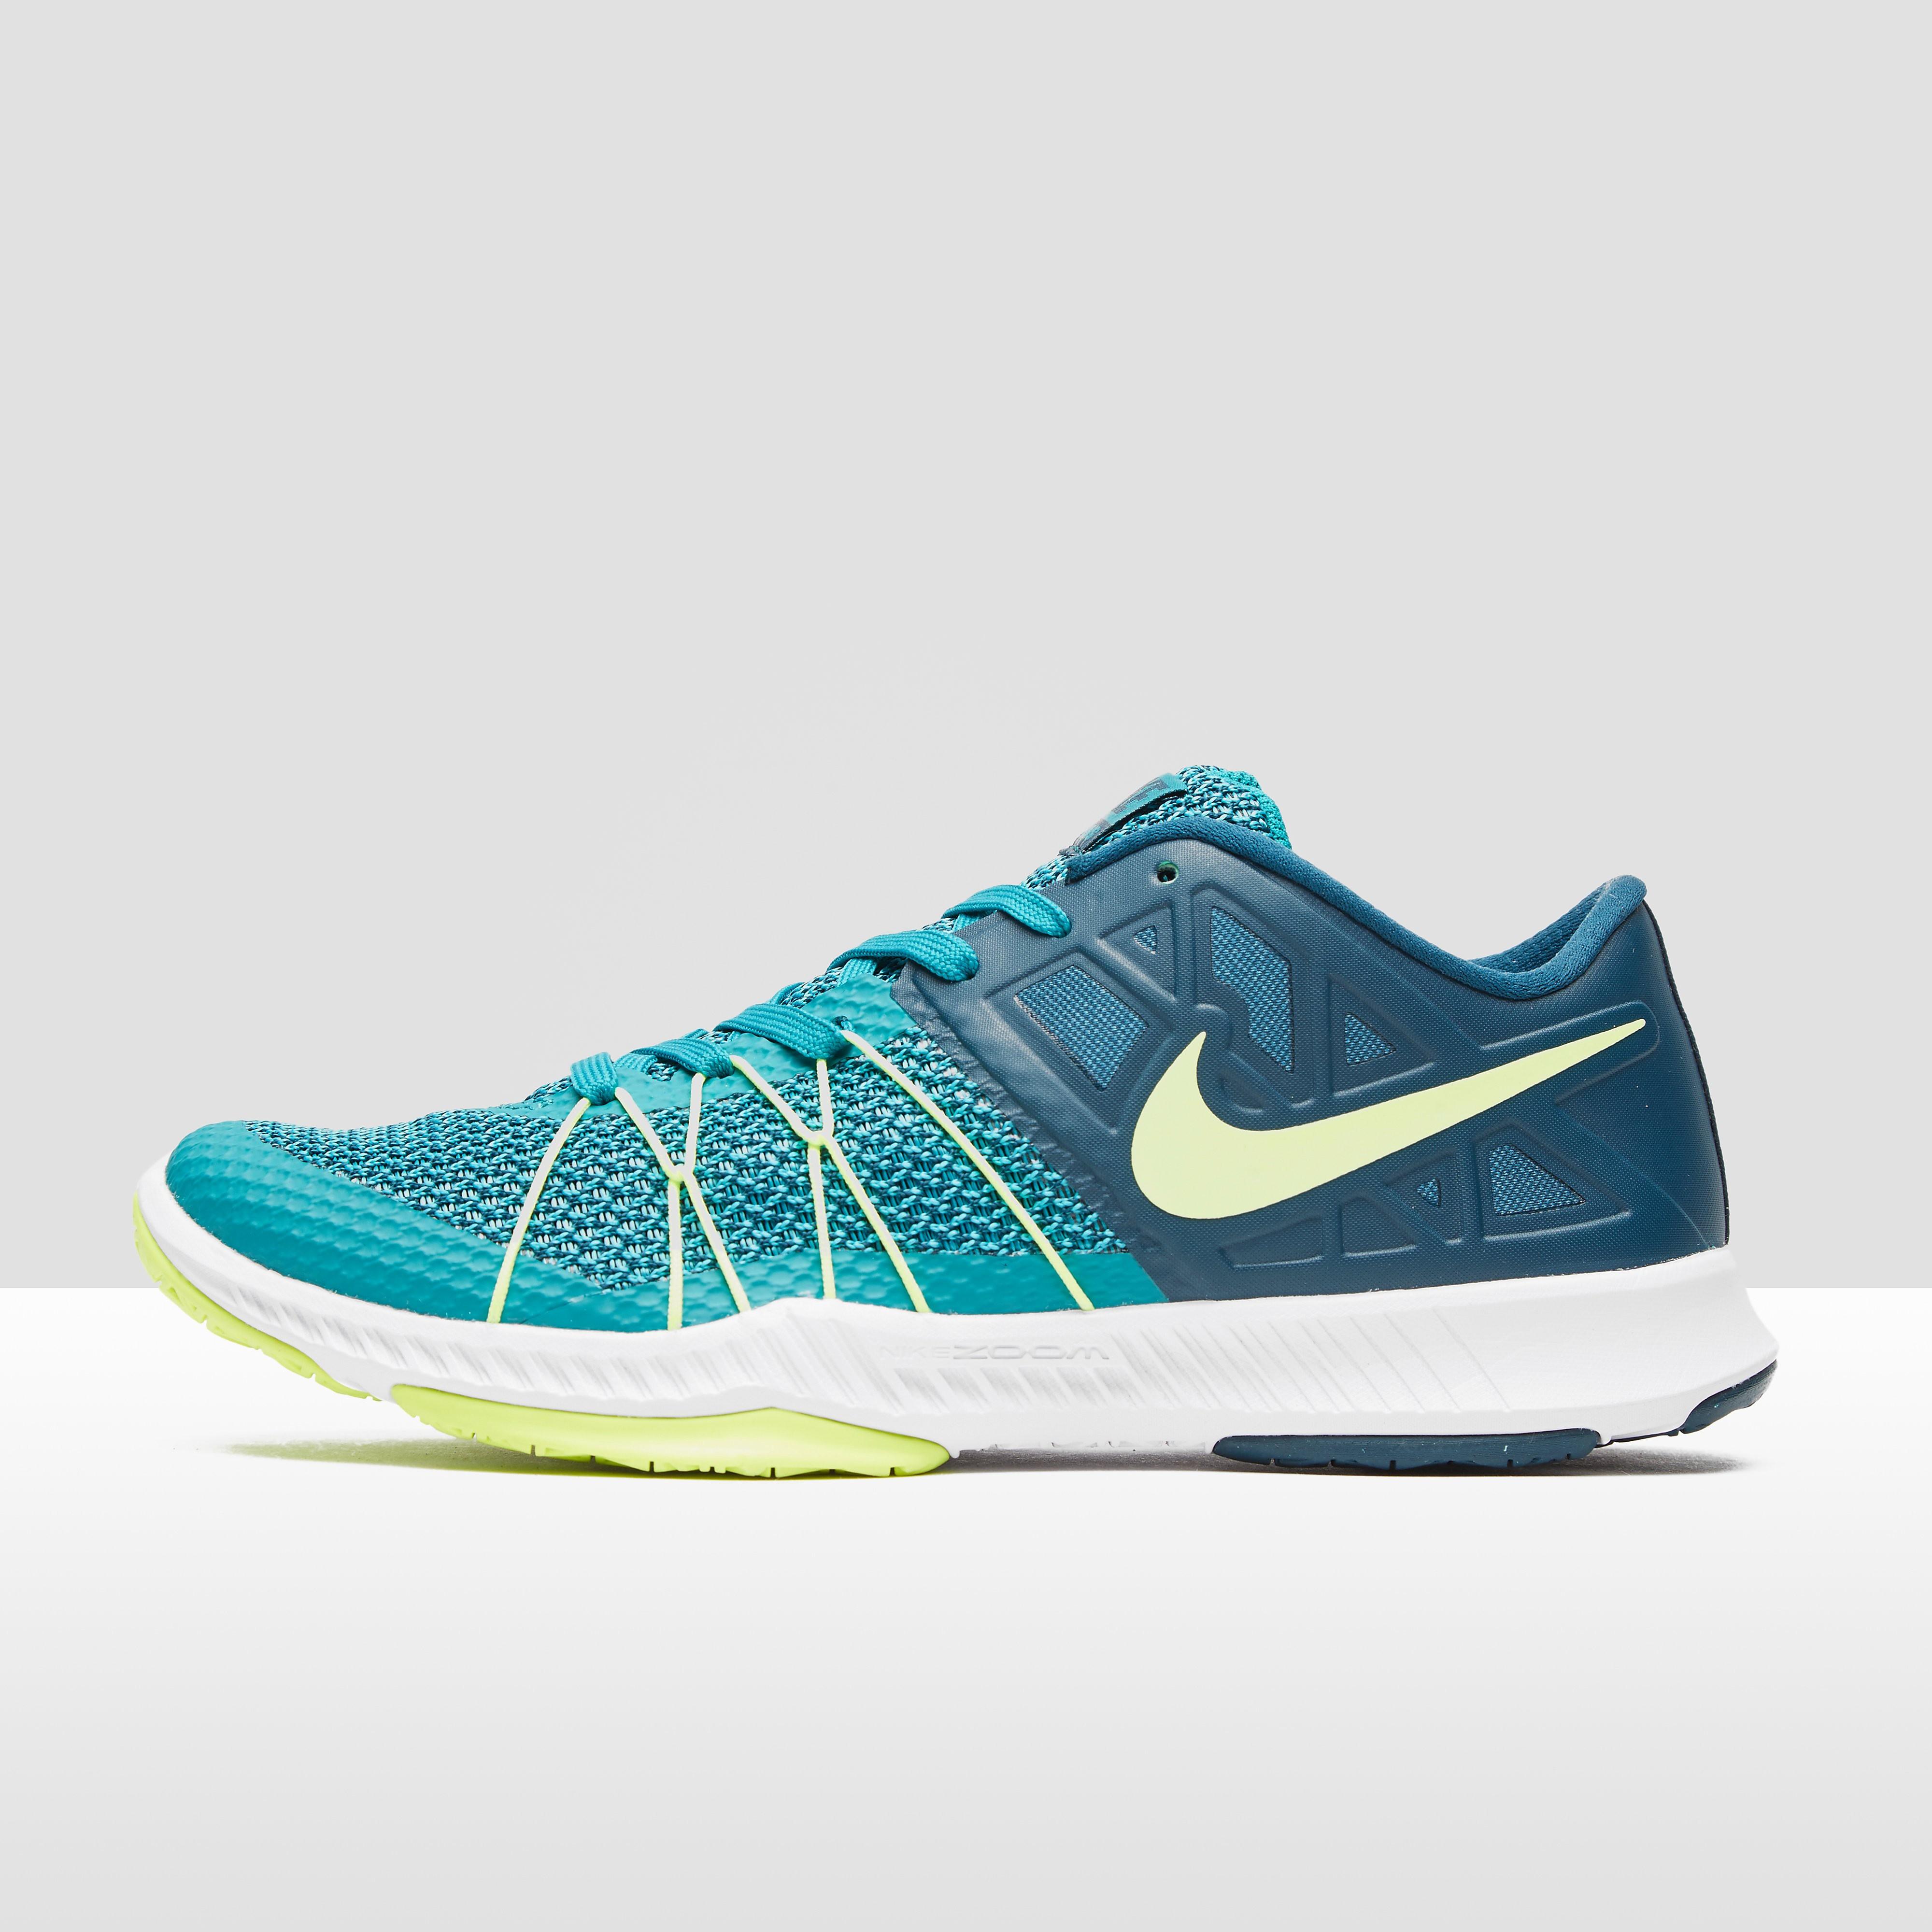 Nike Zoom Incredibly Fast Men's Training Shoe